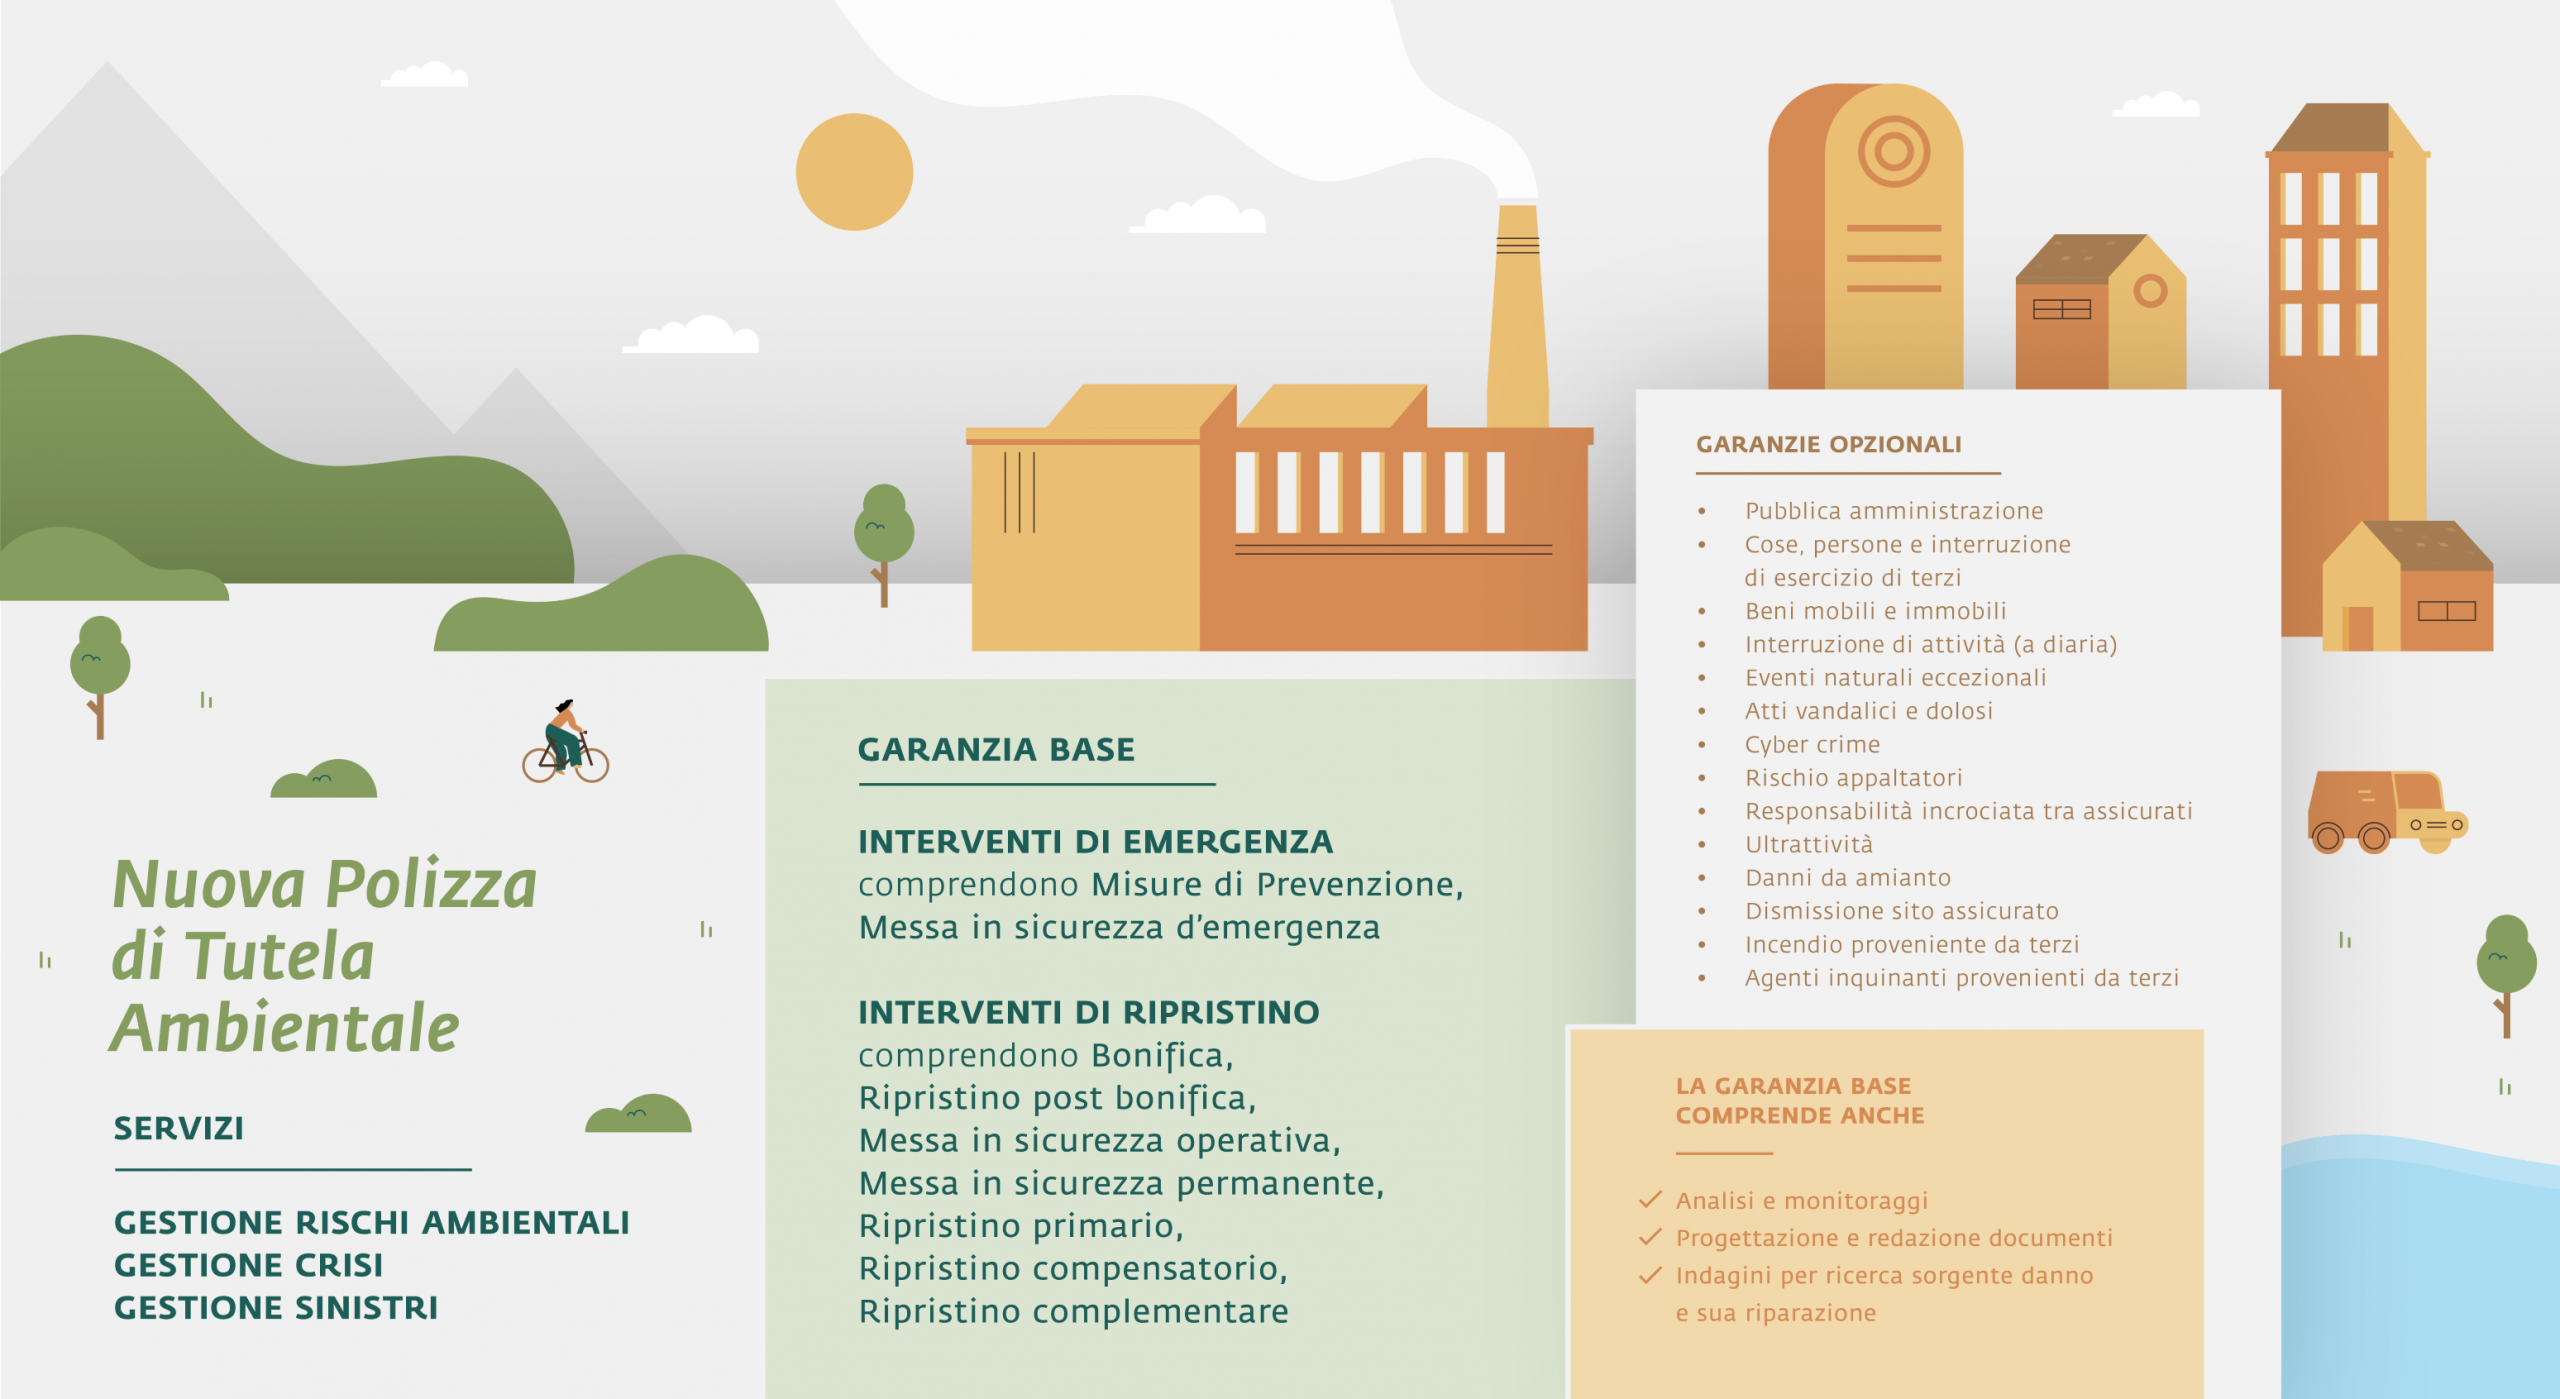 nuova-polizza-tutela-ambientale